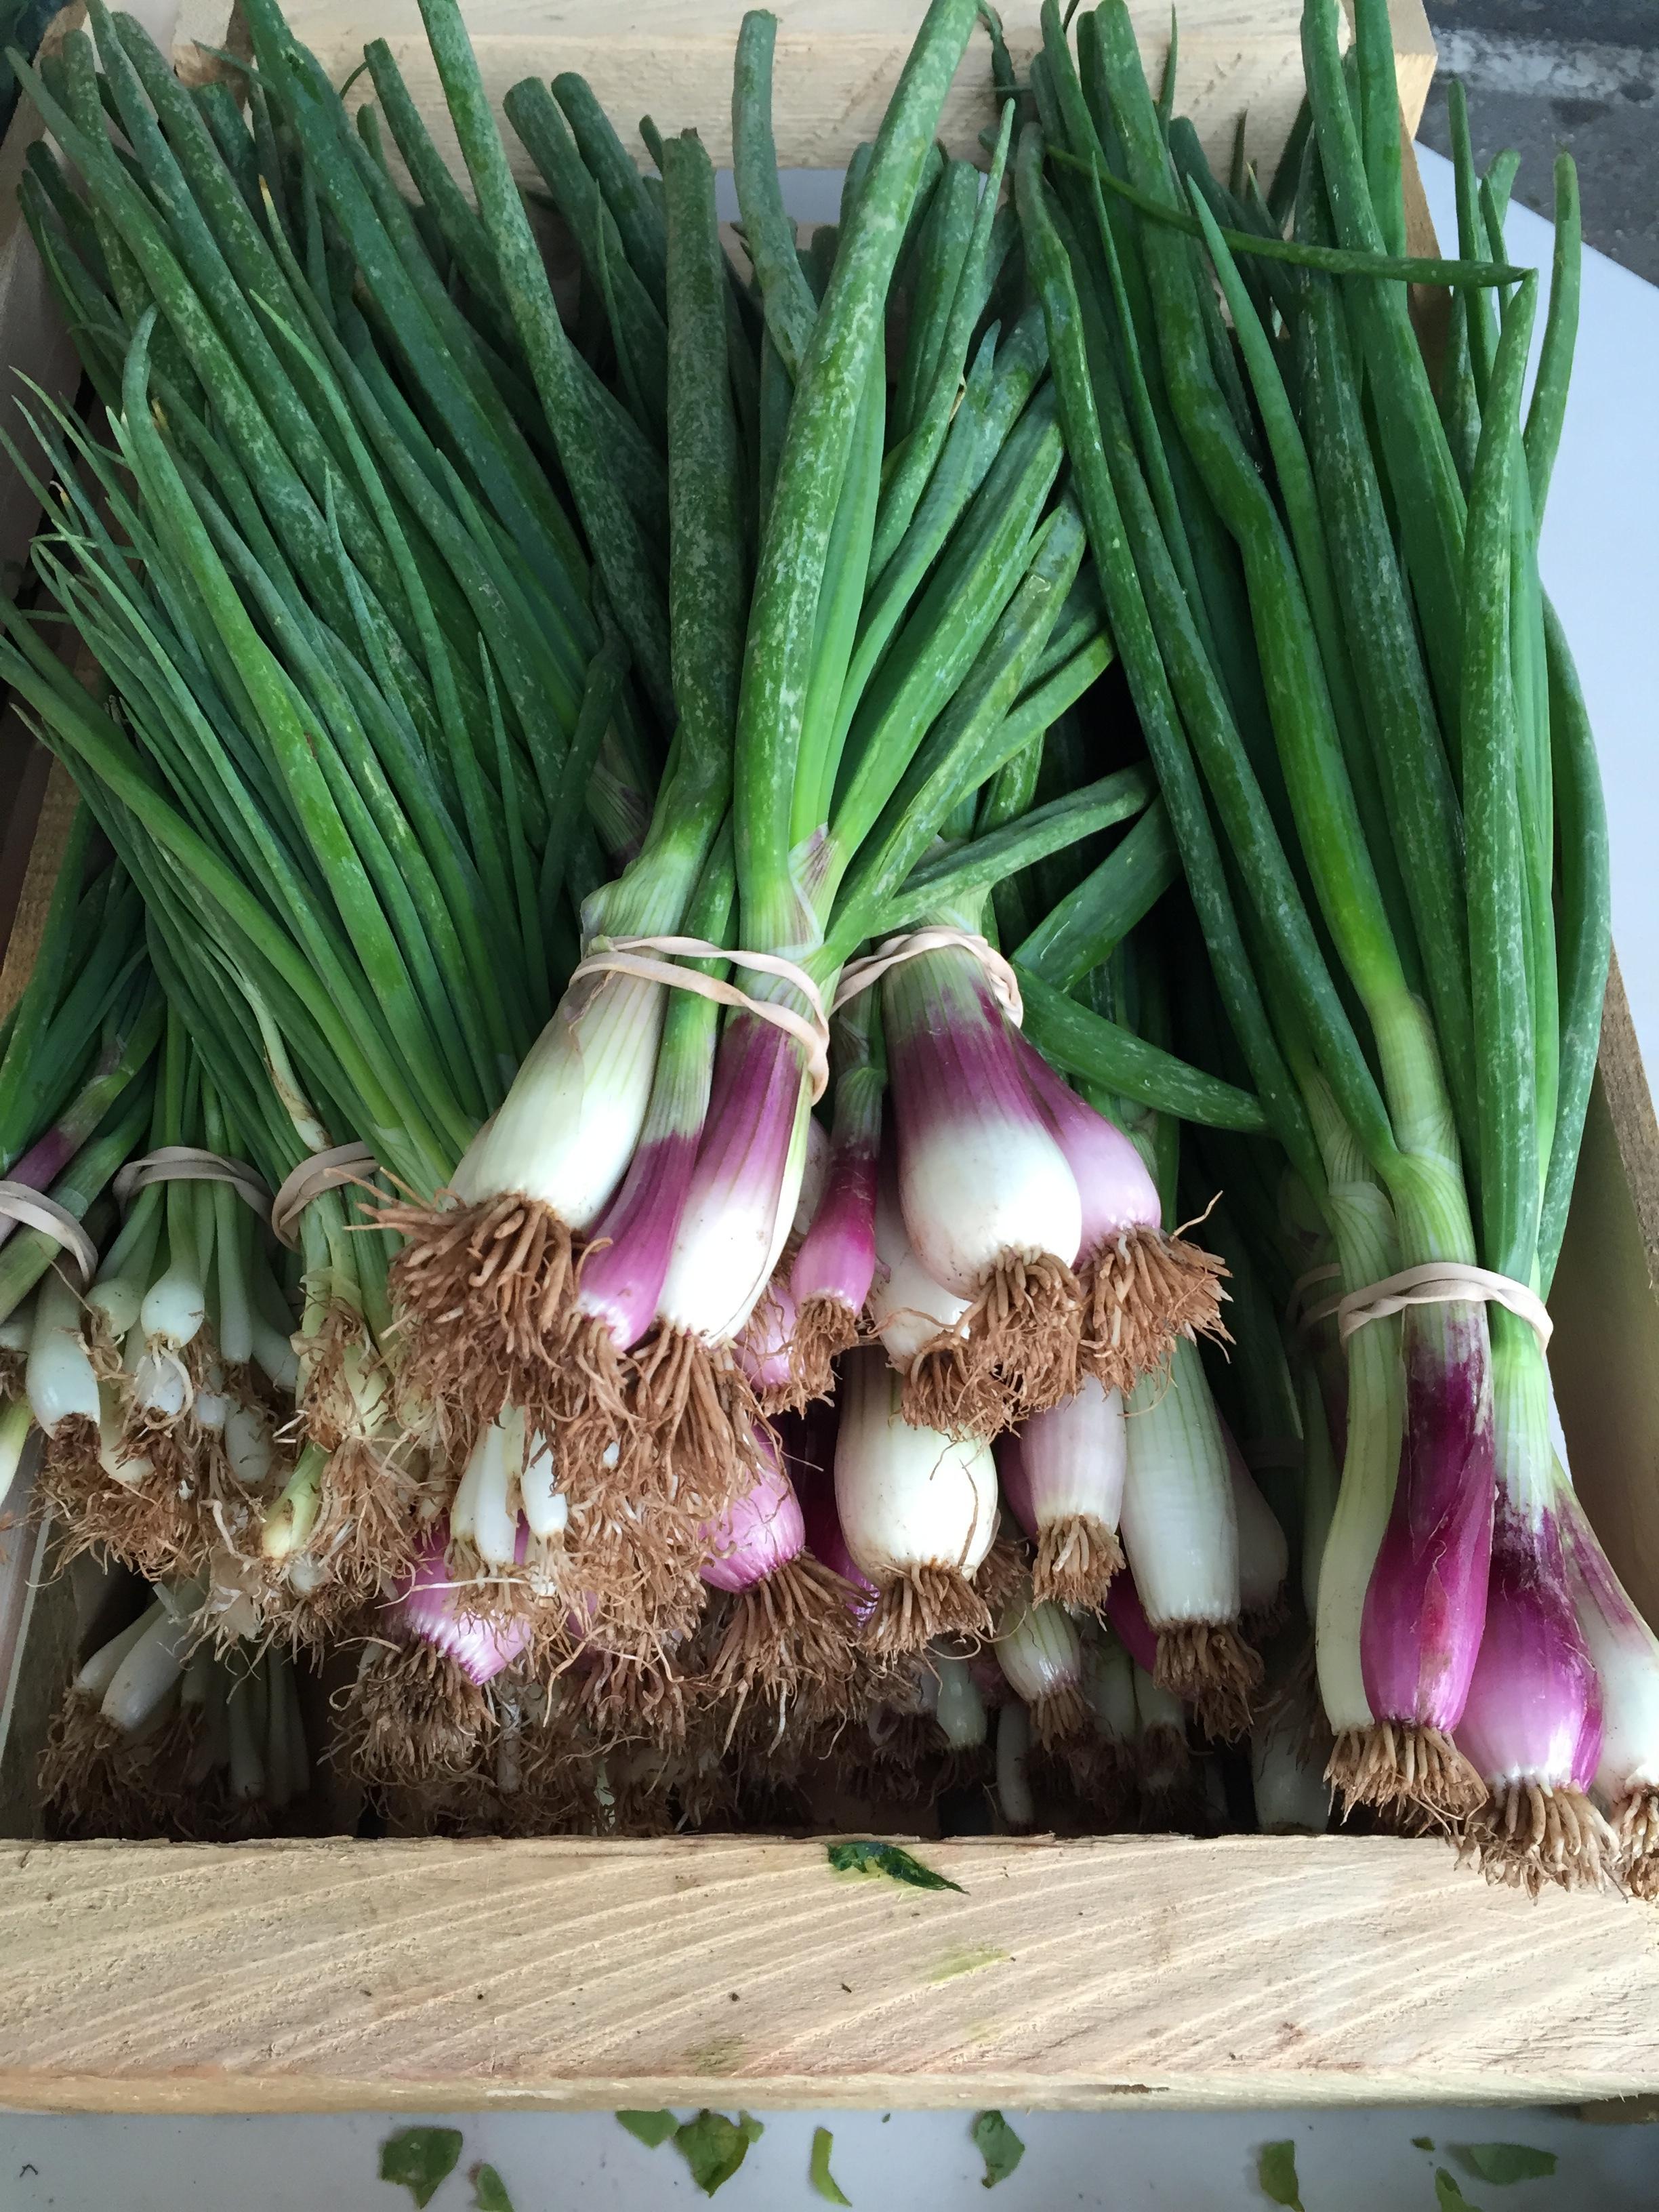 Green Onions at Farmers Market